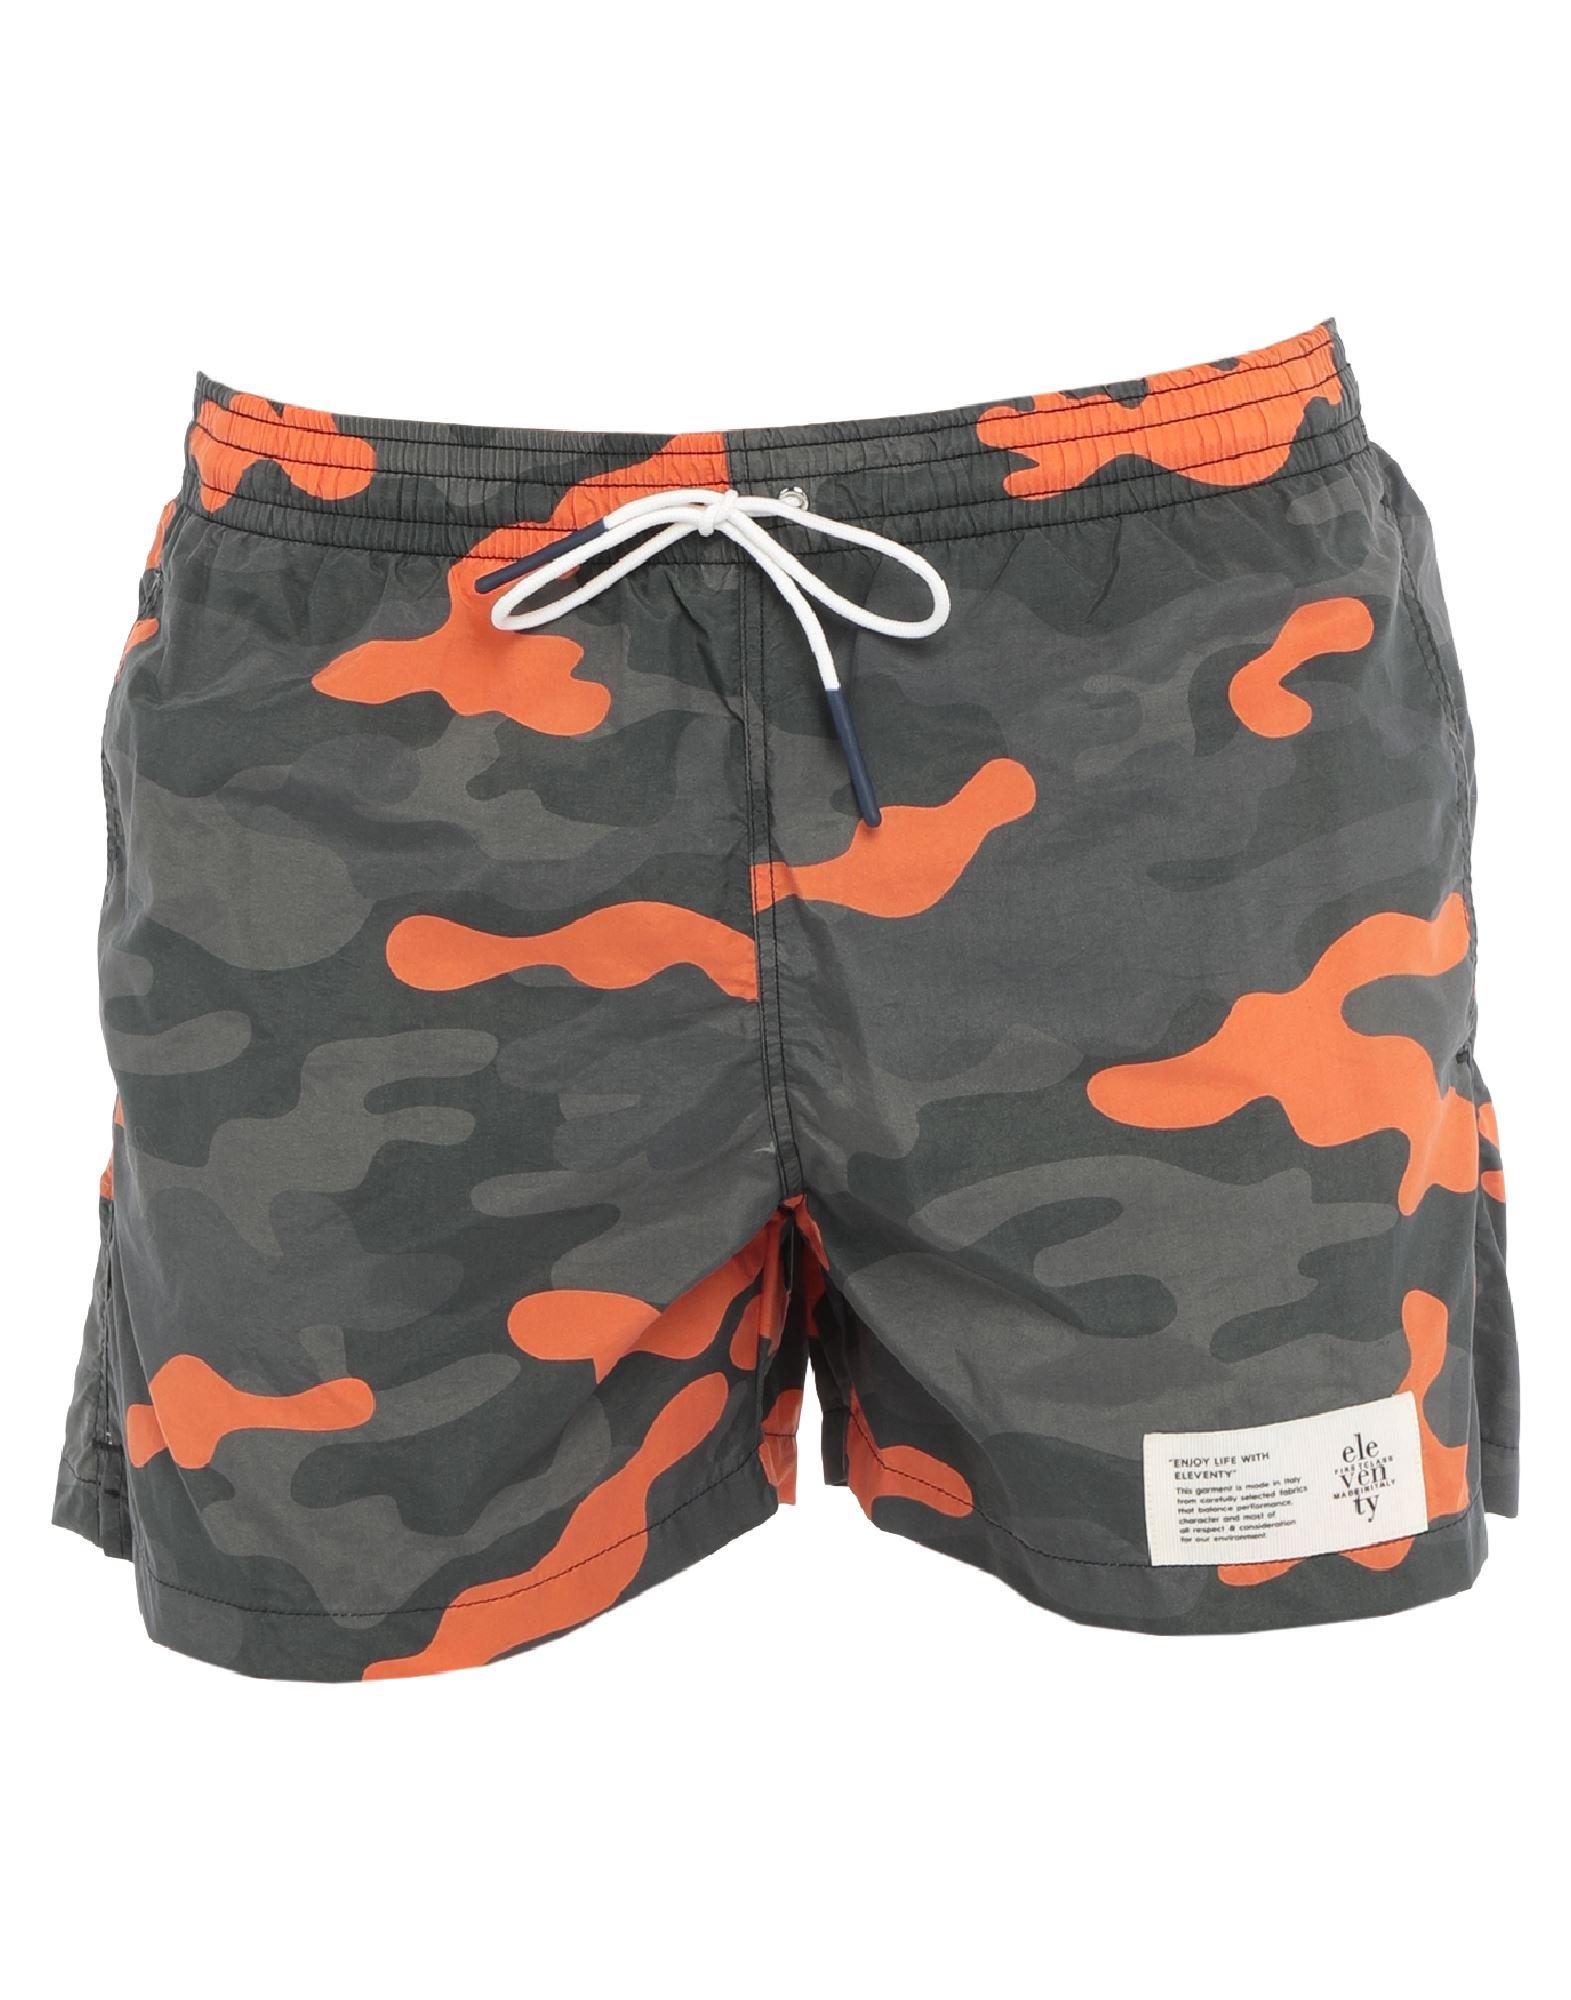 ELEVENTY Swim trunks. techno fabric, logo, camouflage, multipockets, drawstring closure, internal slip. 100% Polyamide